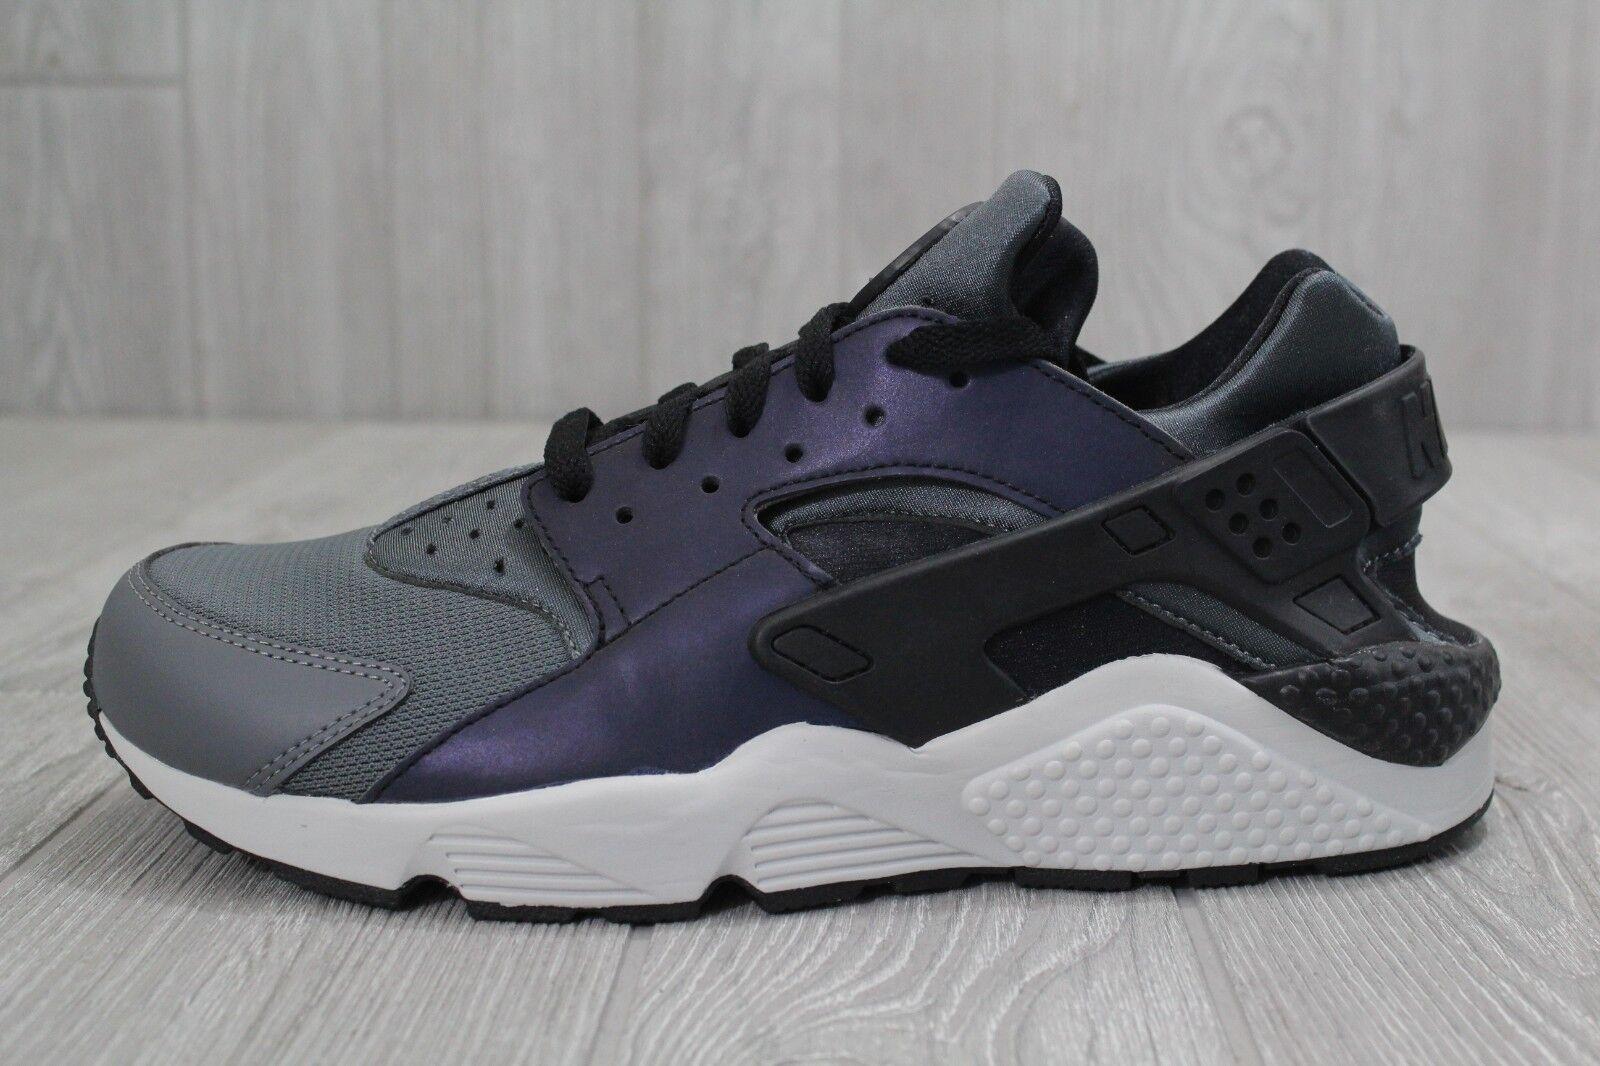 Comfortable and good-looking 26 New Mens Nike Air Huarache Run PRM 704830-007 Dark Grey Shoes Comfortable